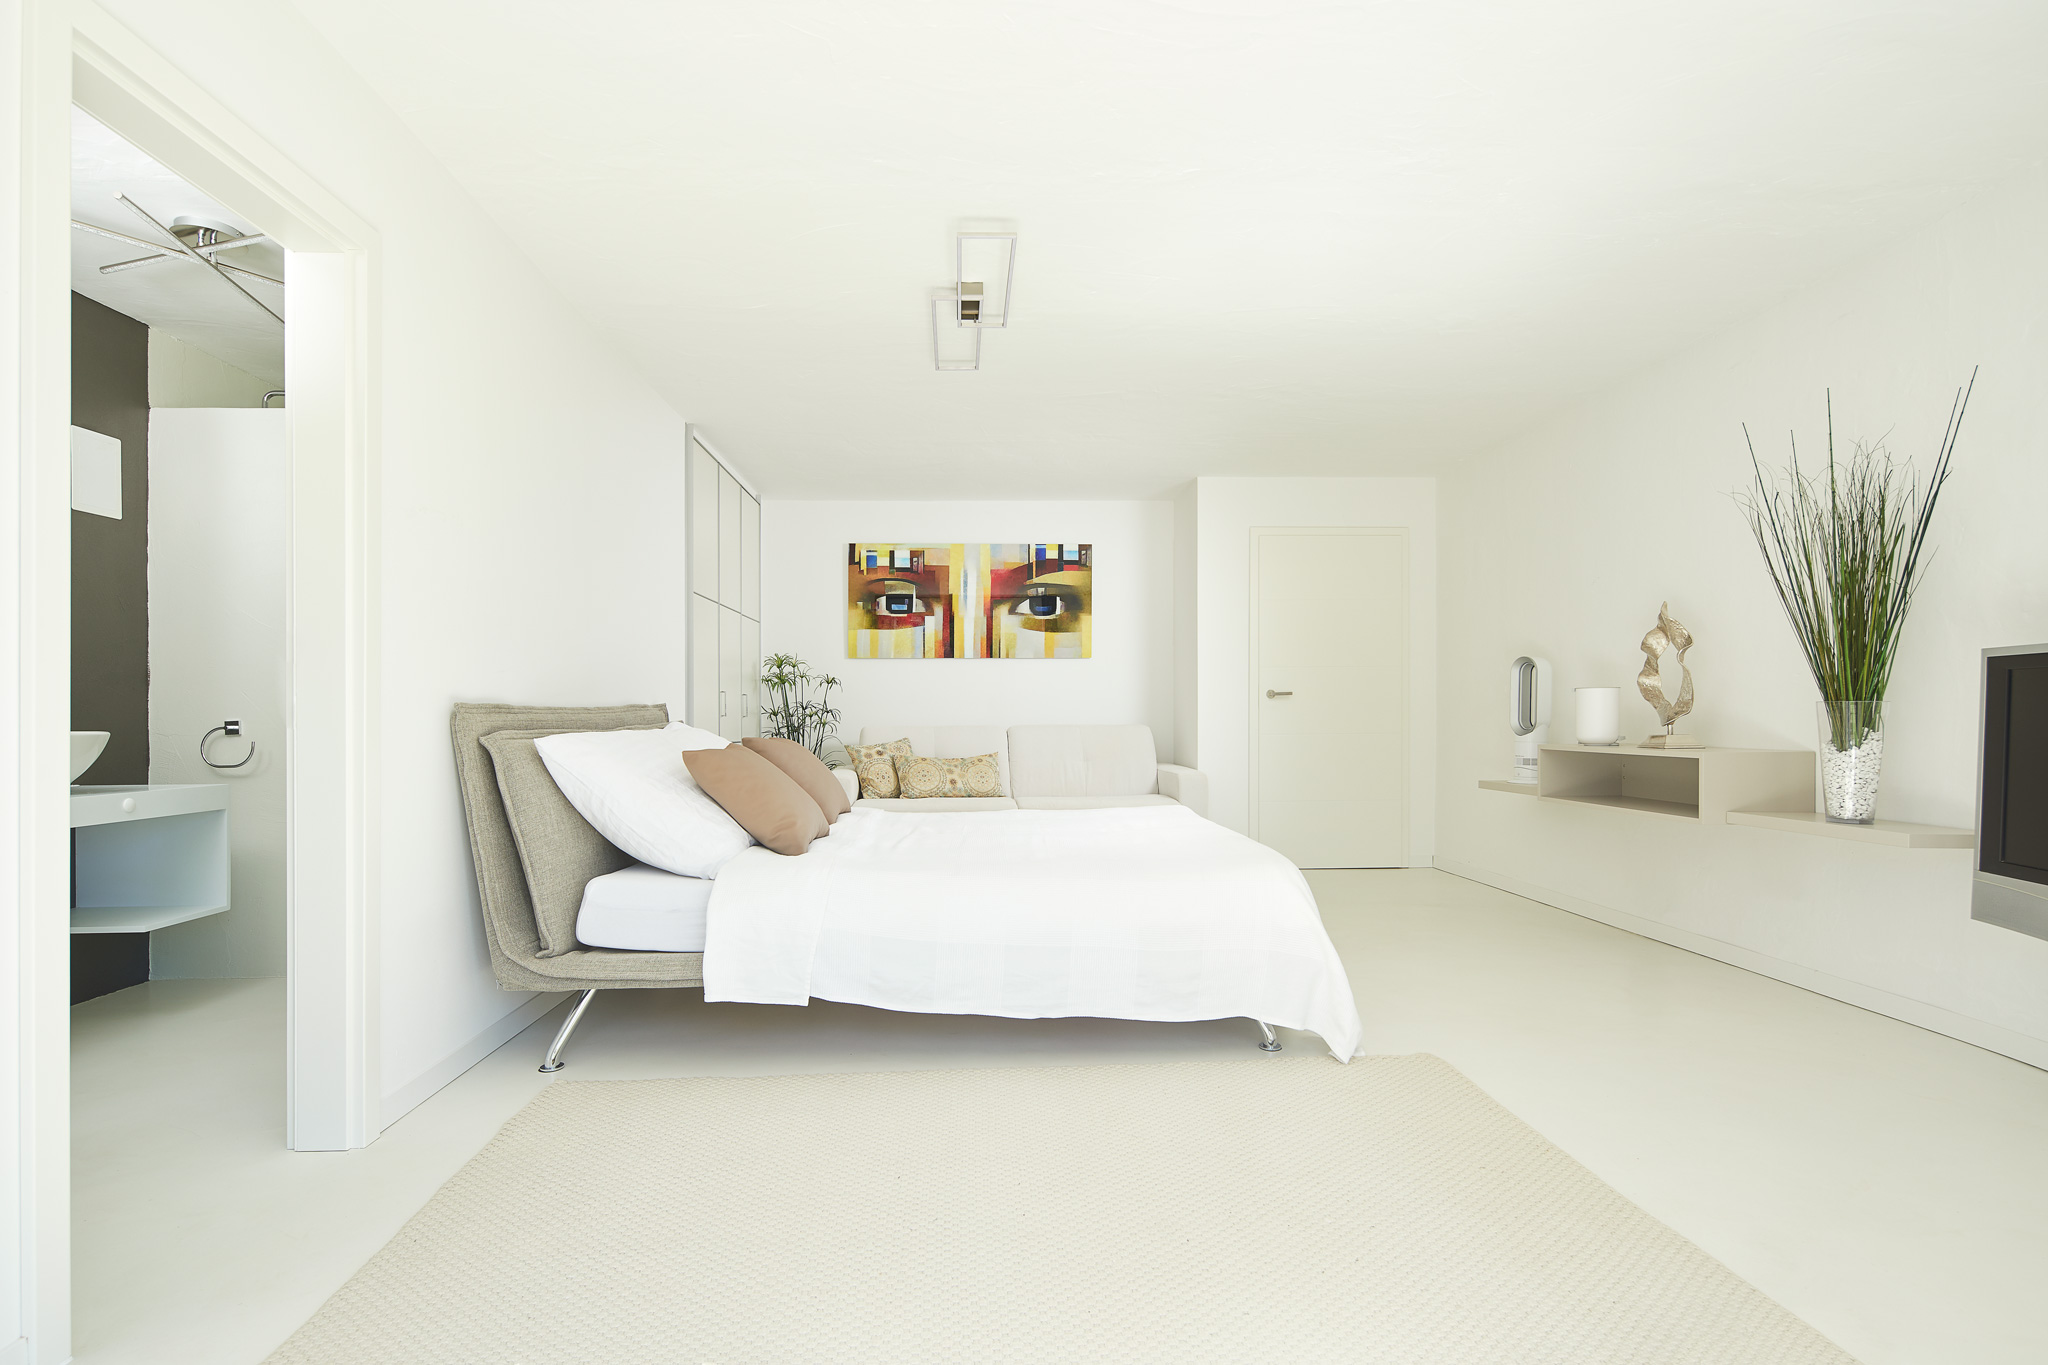 Bedroom_4.1.jpg